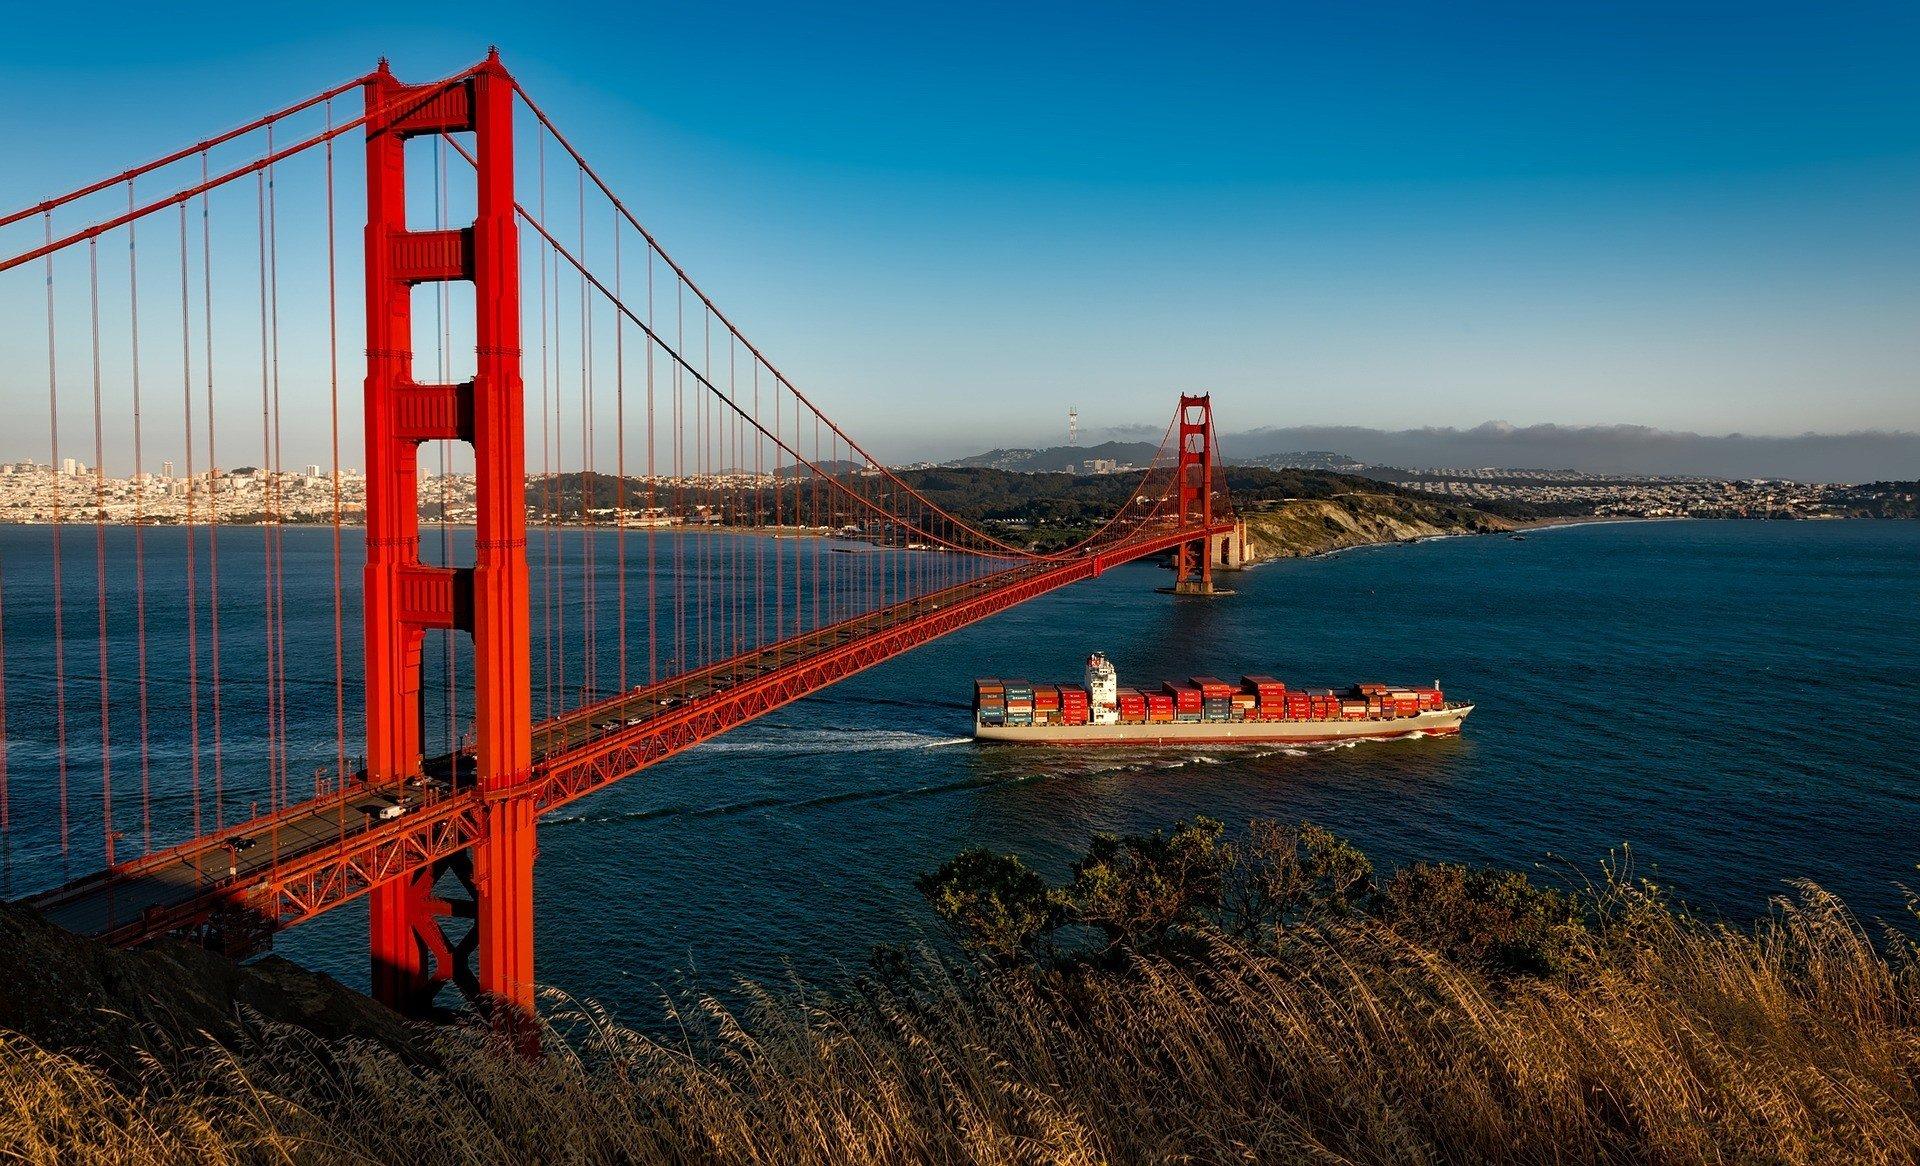 when to visit San Francisco